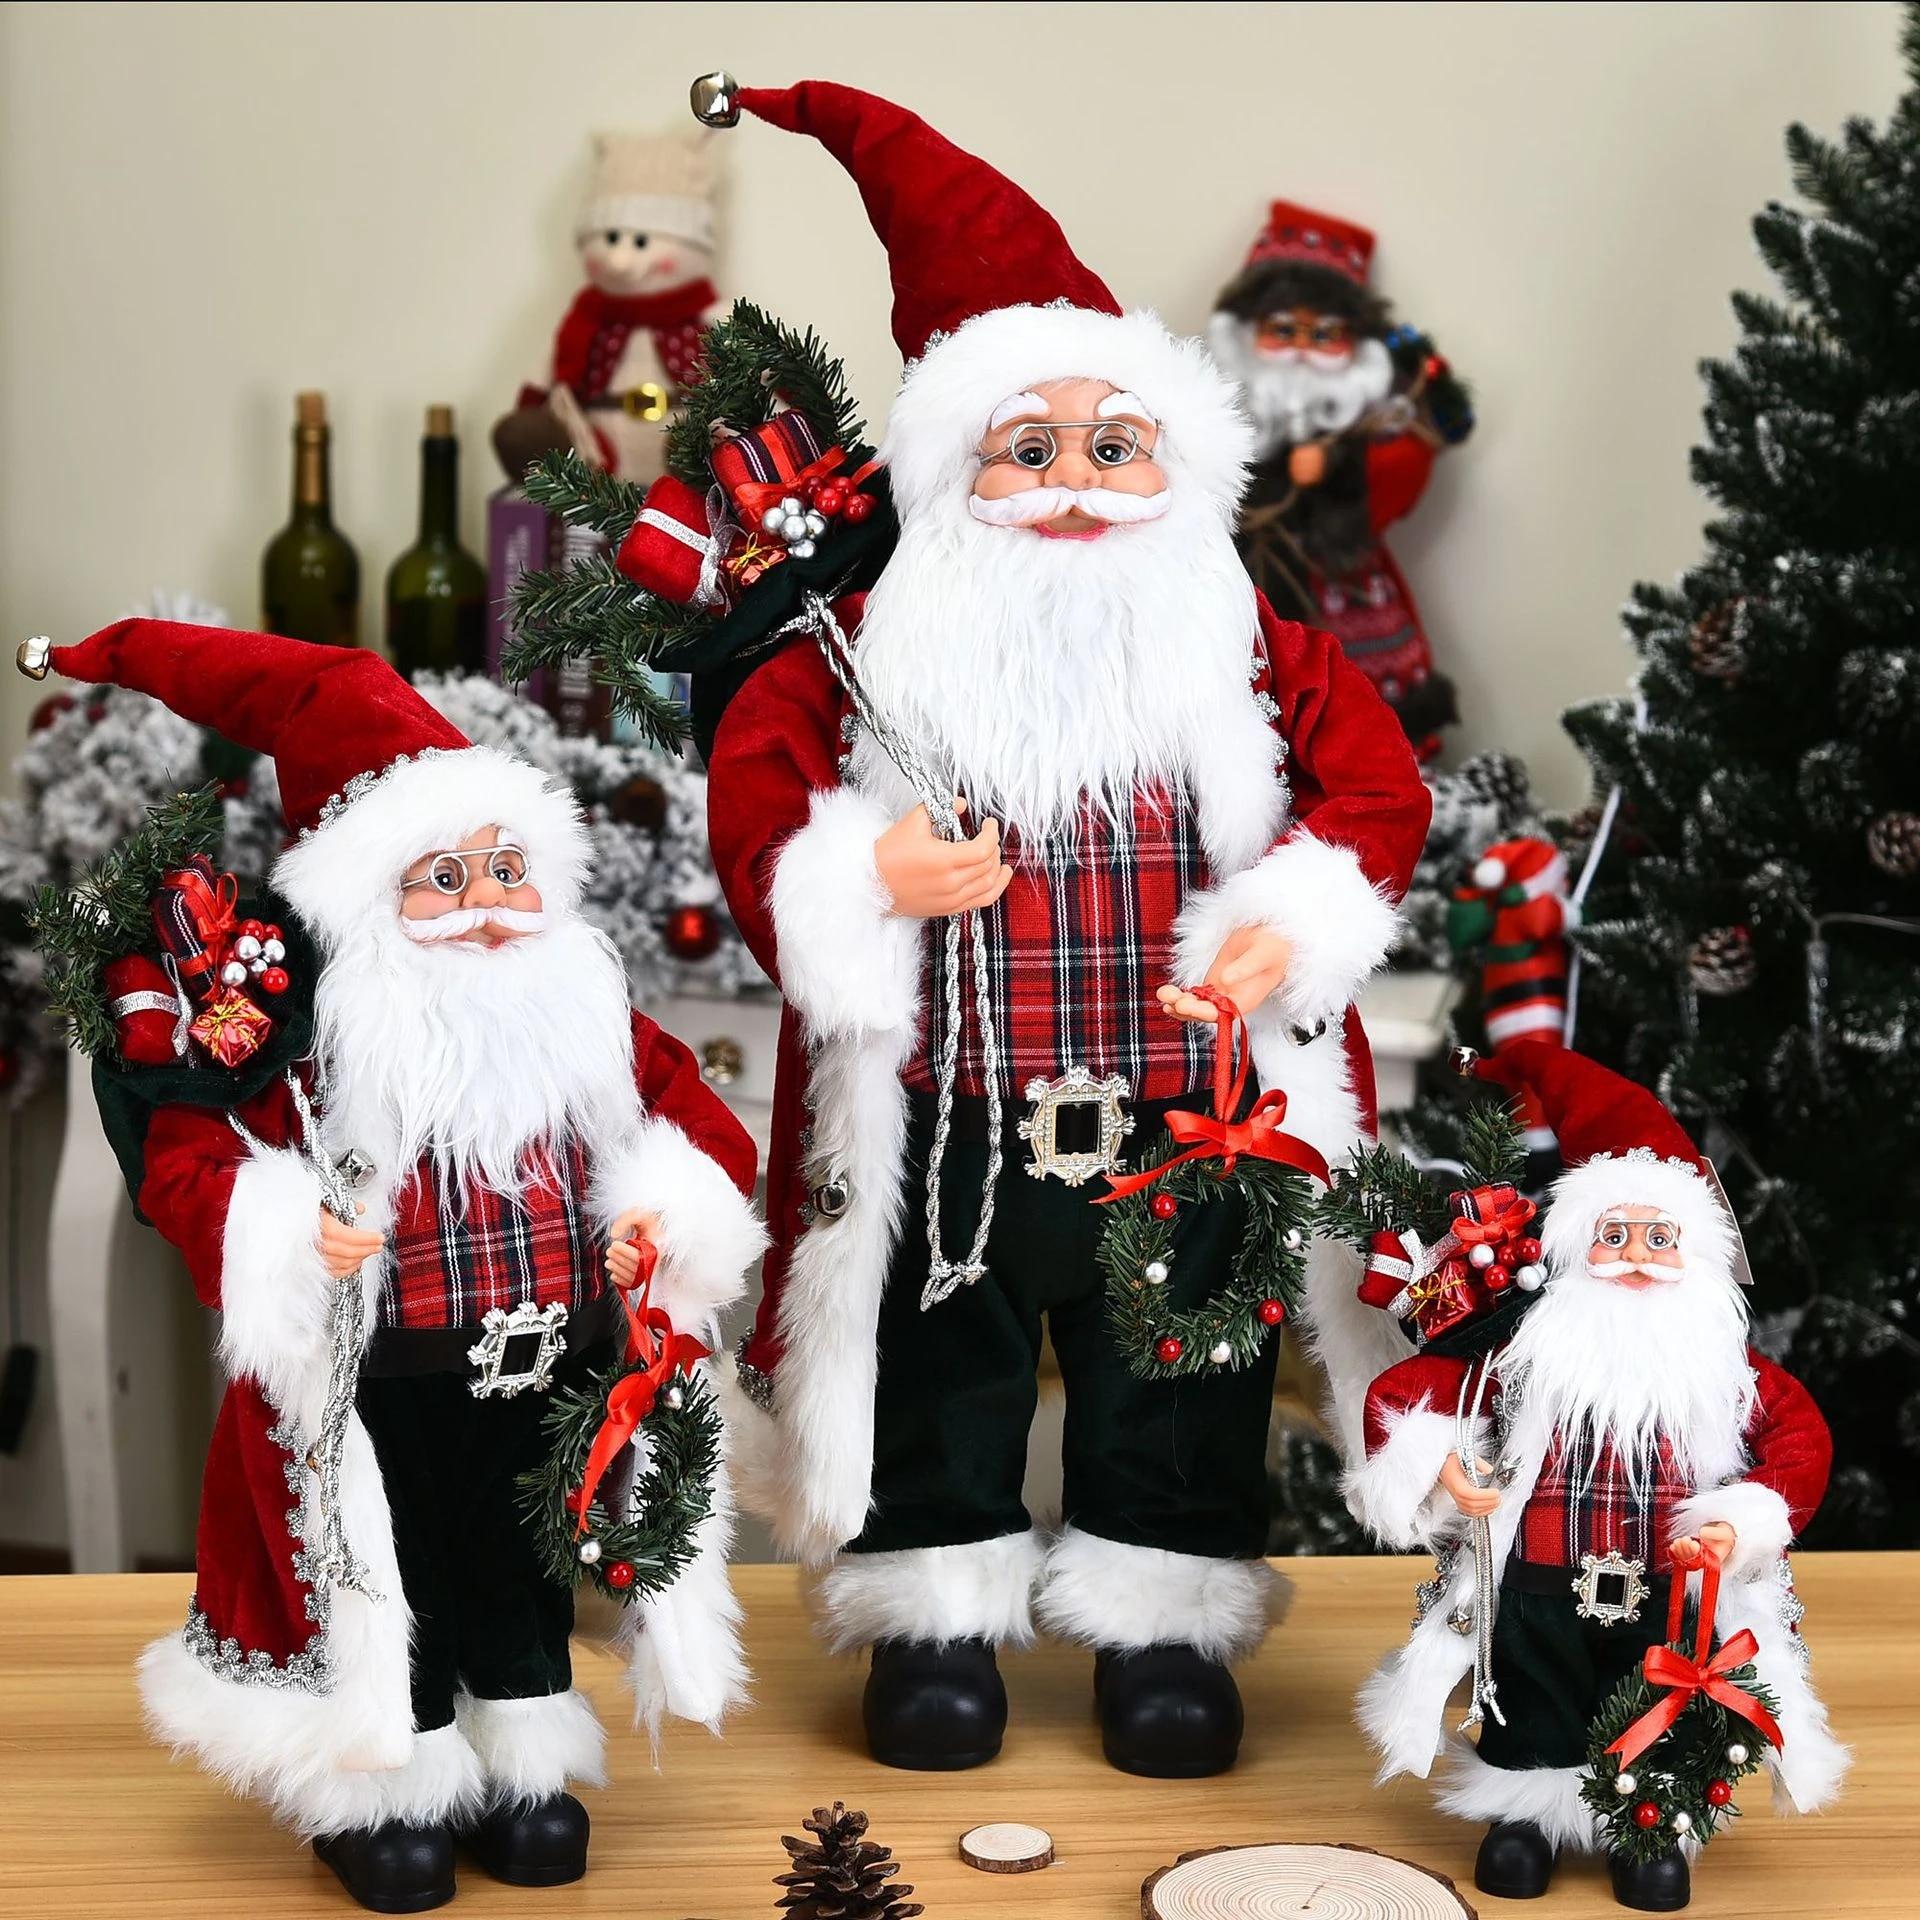 Christmas Ornaments 2021 Series End Christmas Decorations 2021 High End Simulation Santa Claus Figurine Window Scene Decor Creative Plush Santa Claus Toy Ornaments Party Diy Decorations Aliexpress